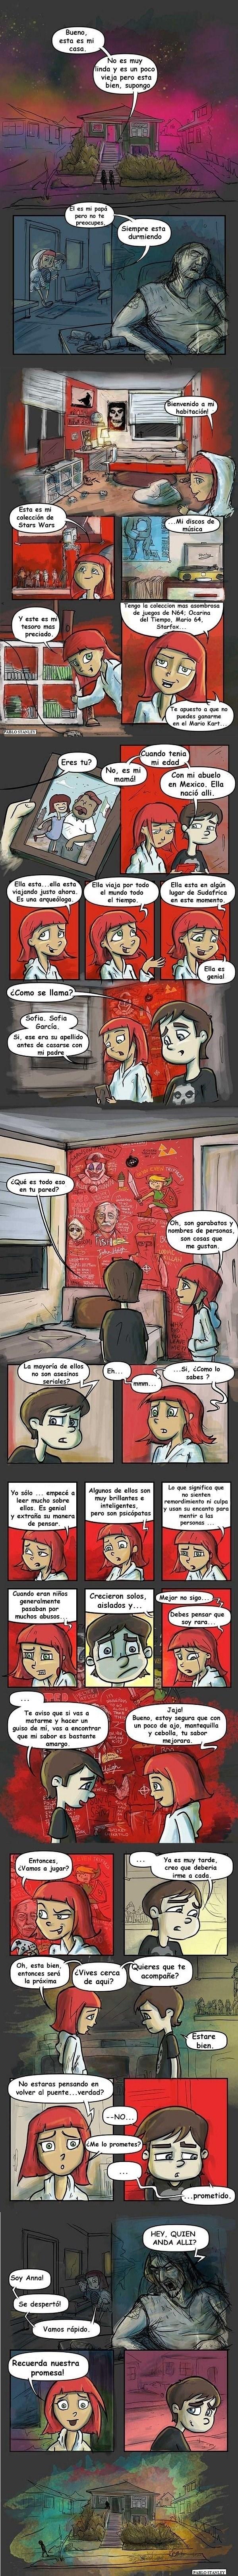 historia triste de dos amigos imaginarios